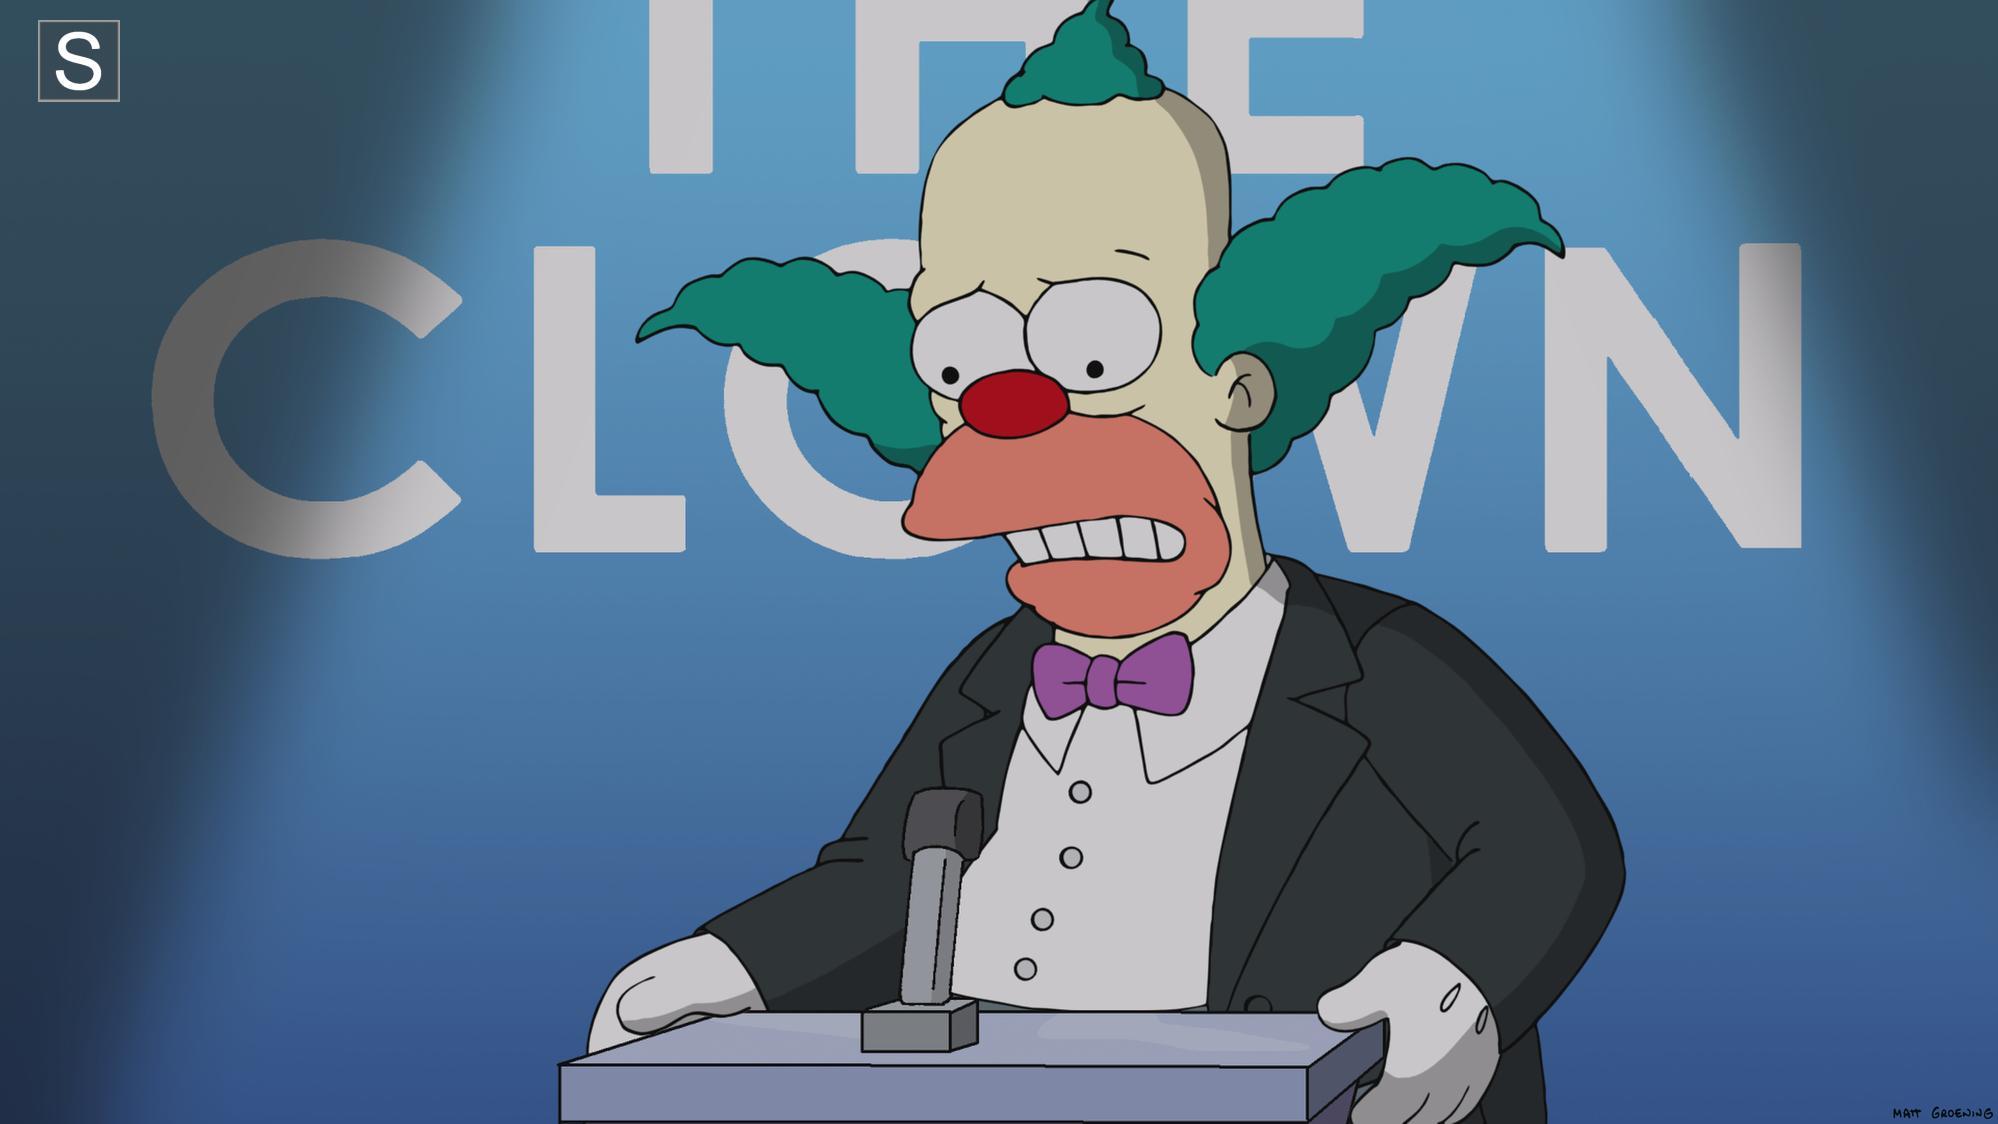 clown in the dumps simpsons wiki fandom powered by wikia